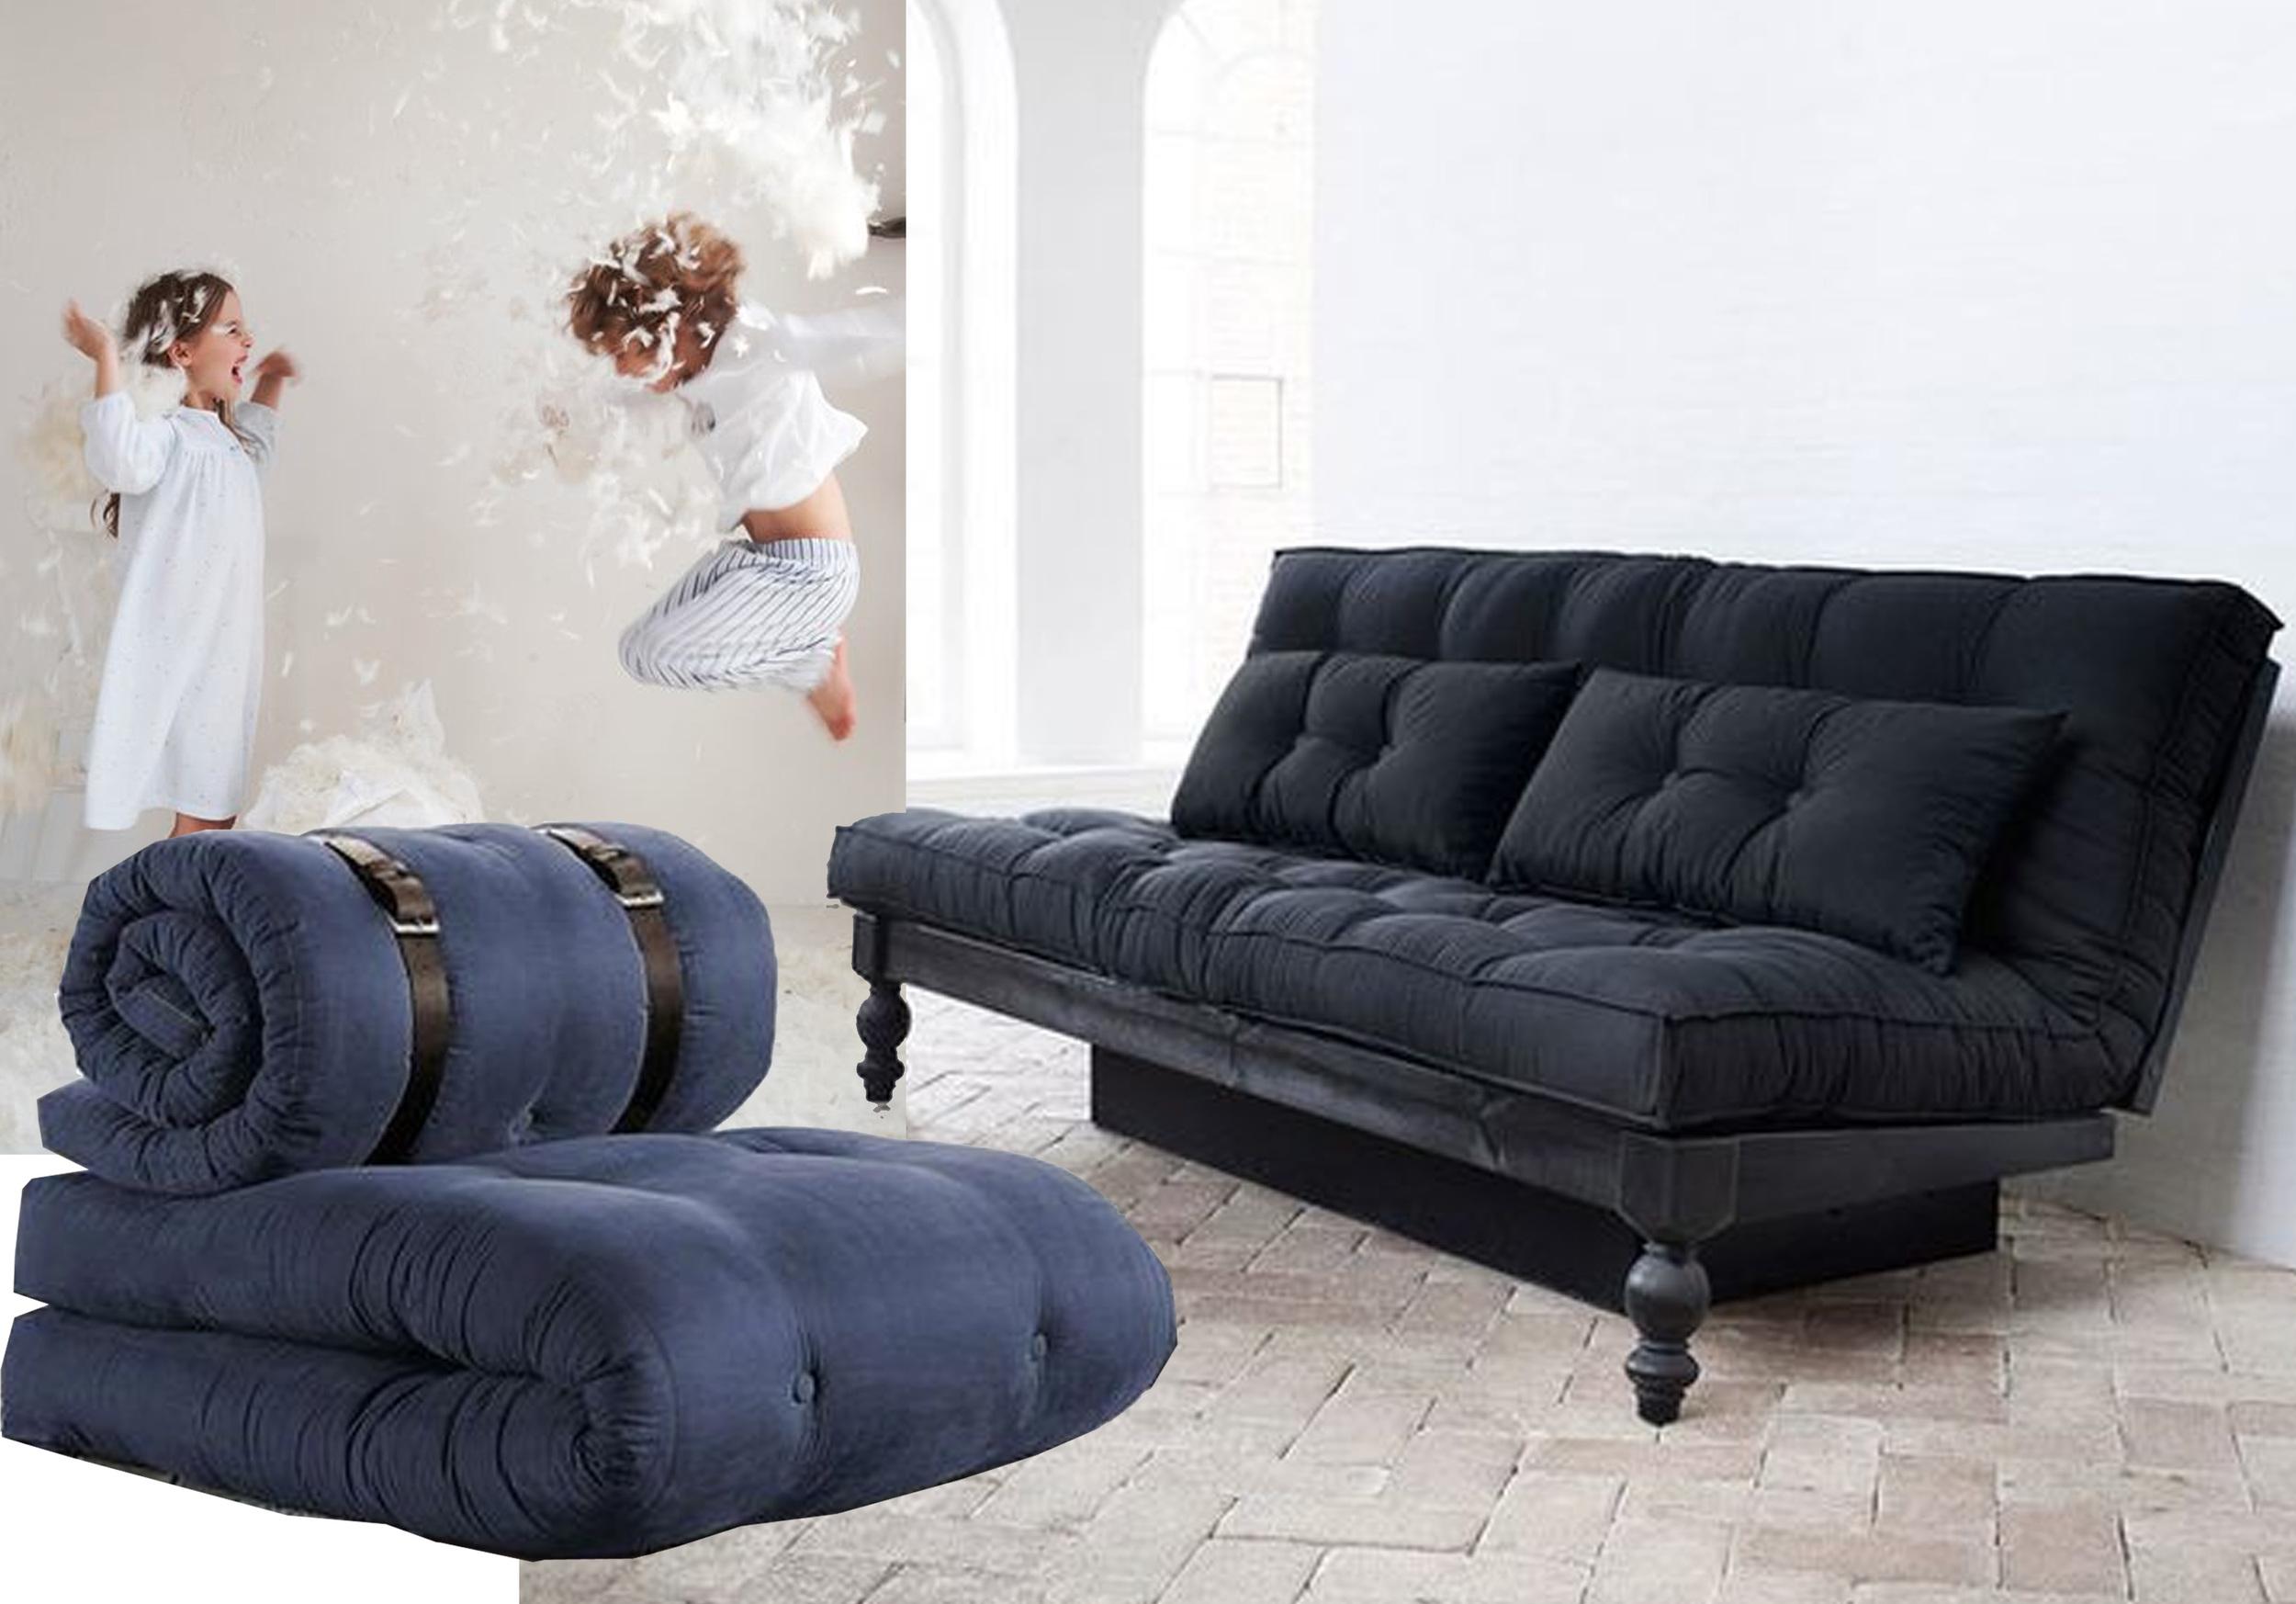 image kids  79 ideas  - futon and daybed  Fresh Futon